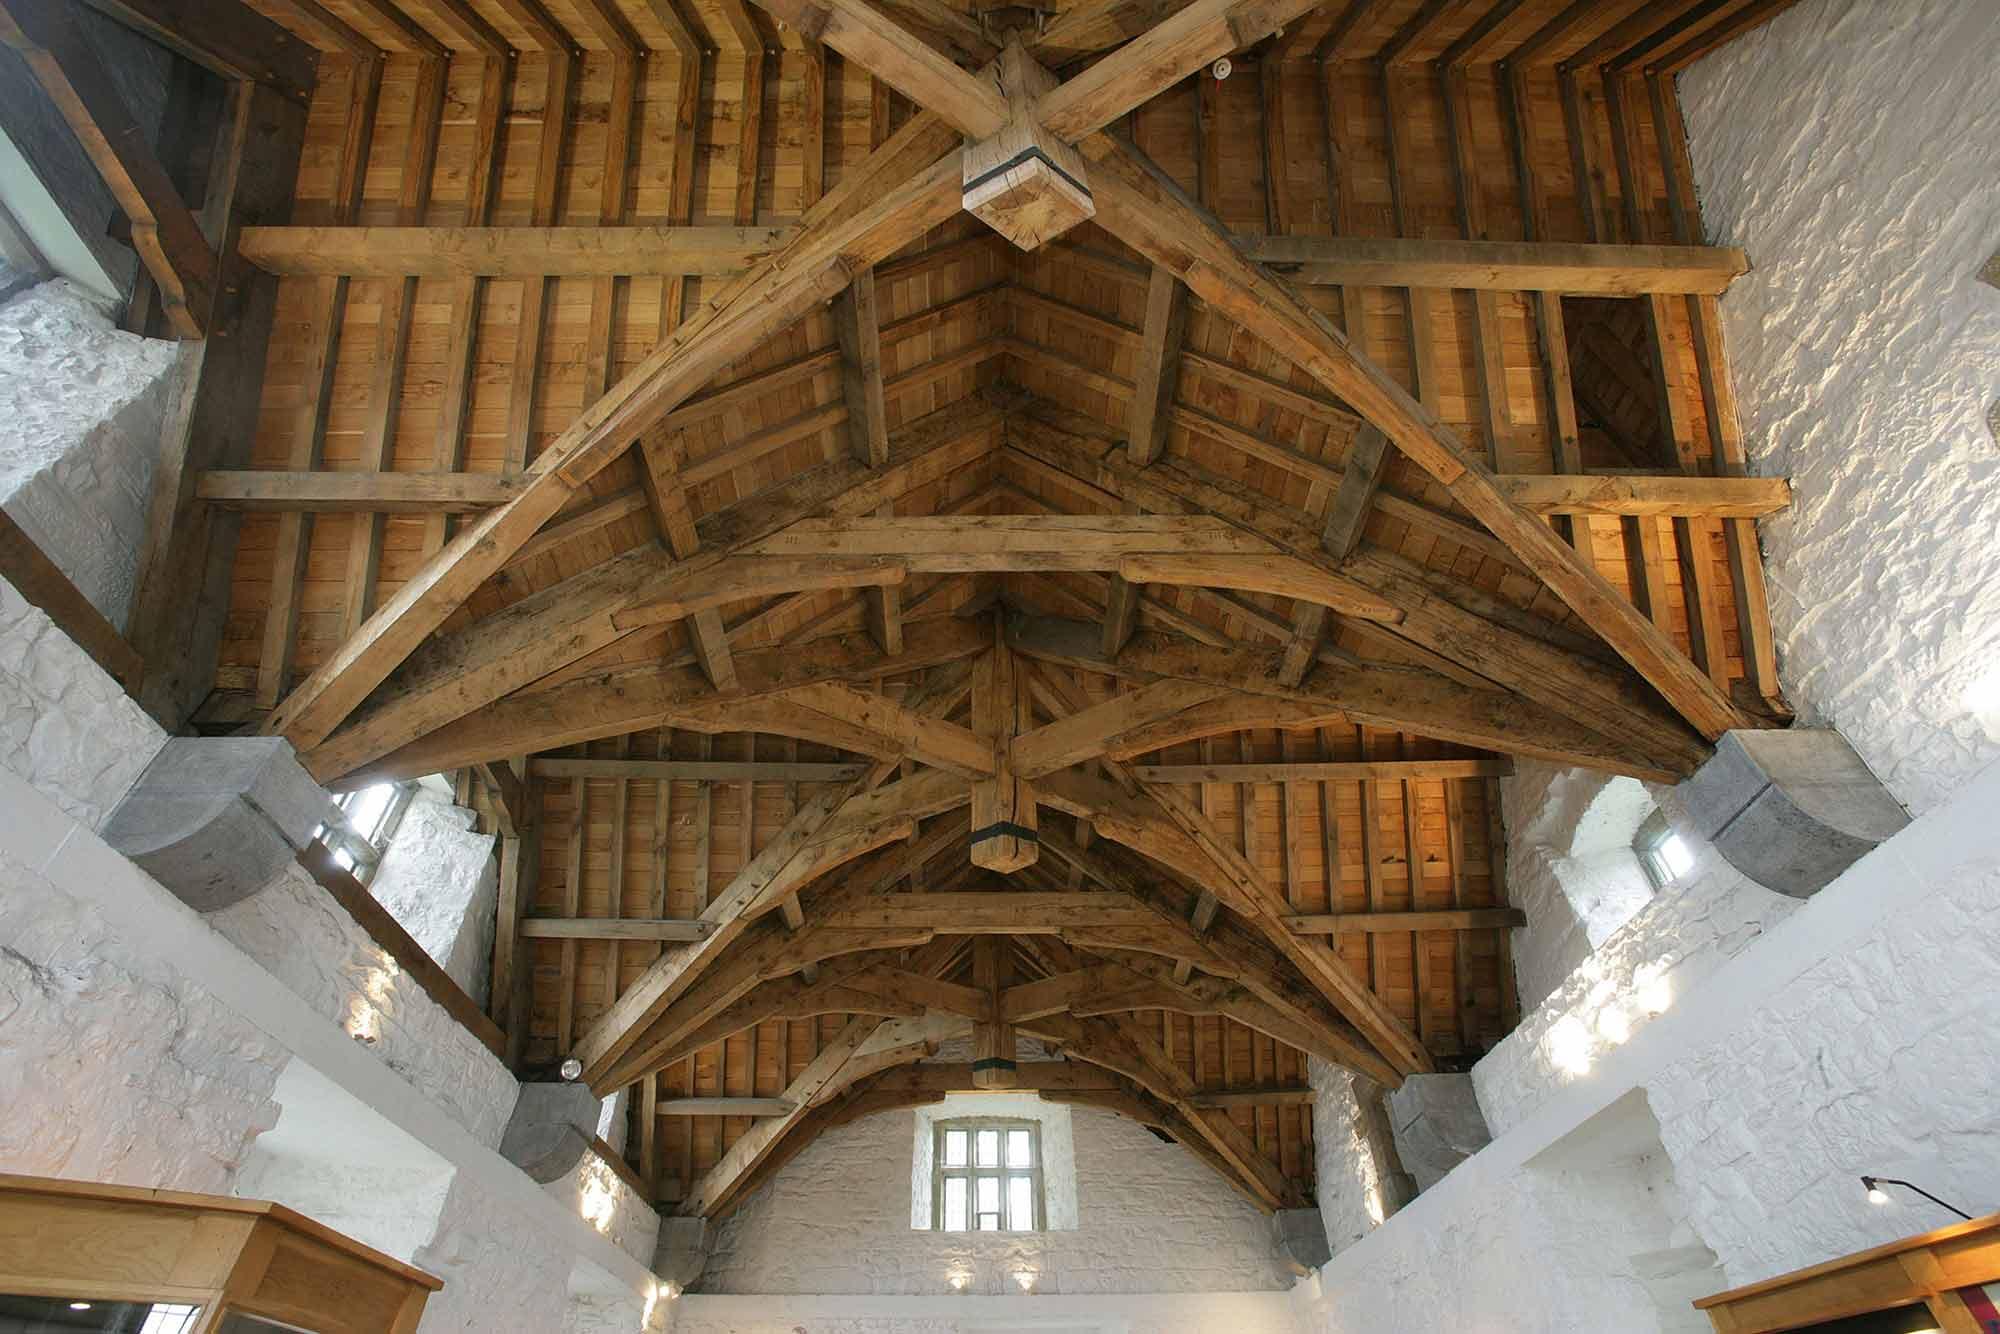 Wooden roof inside Donegal Castle